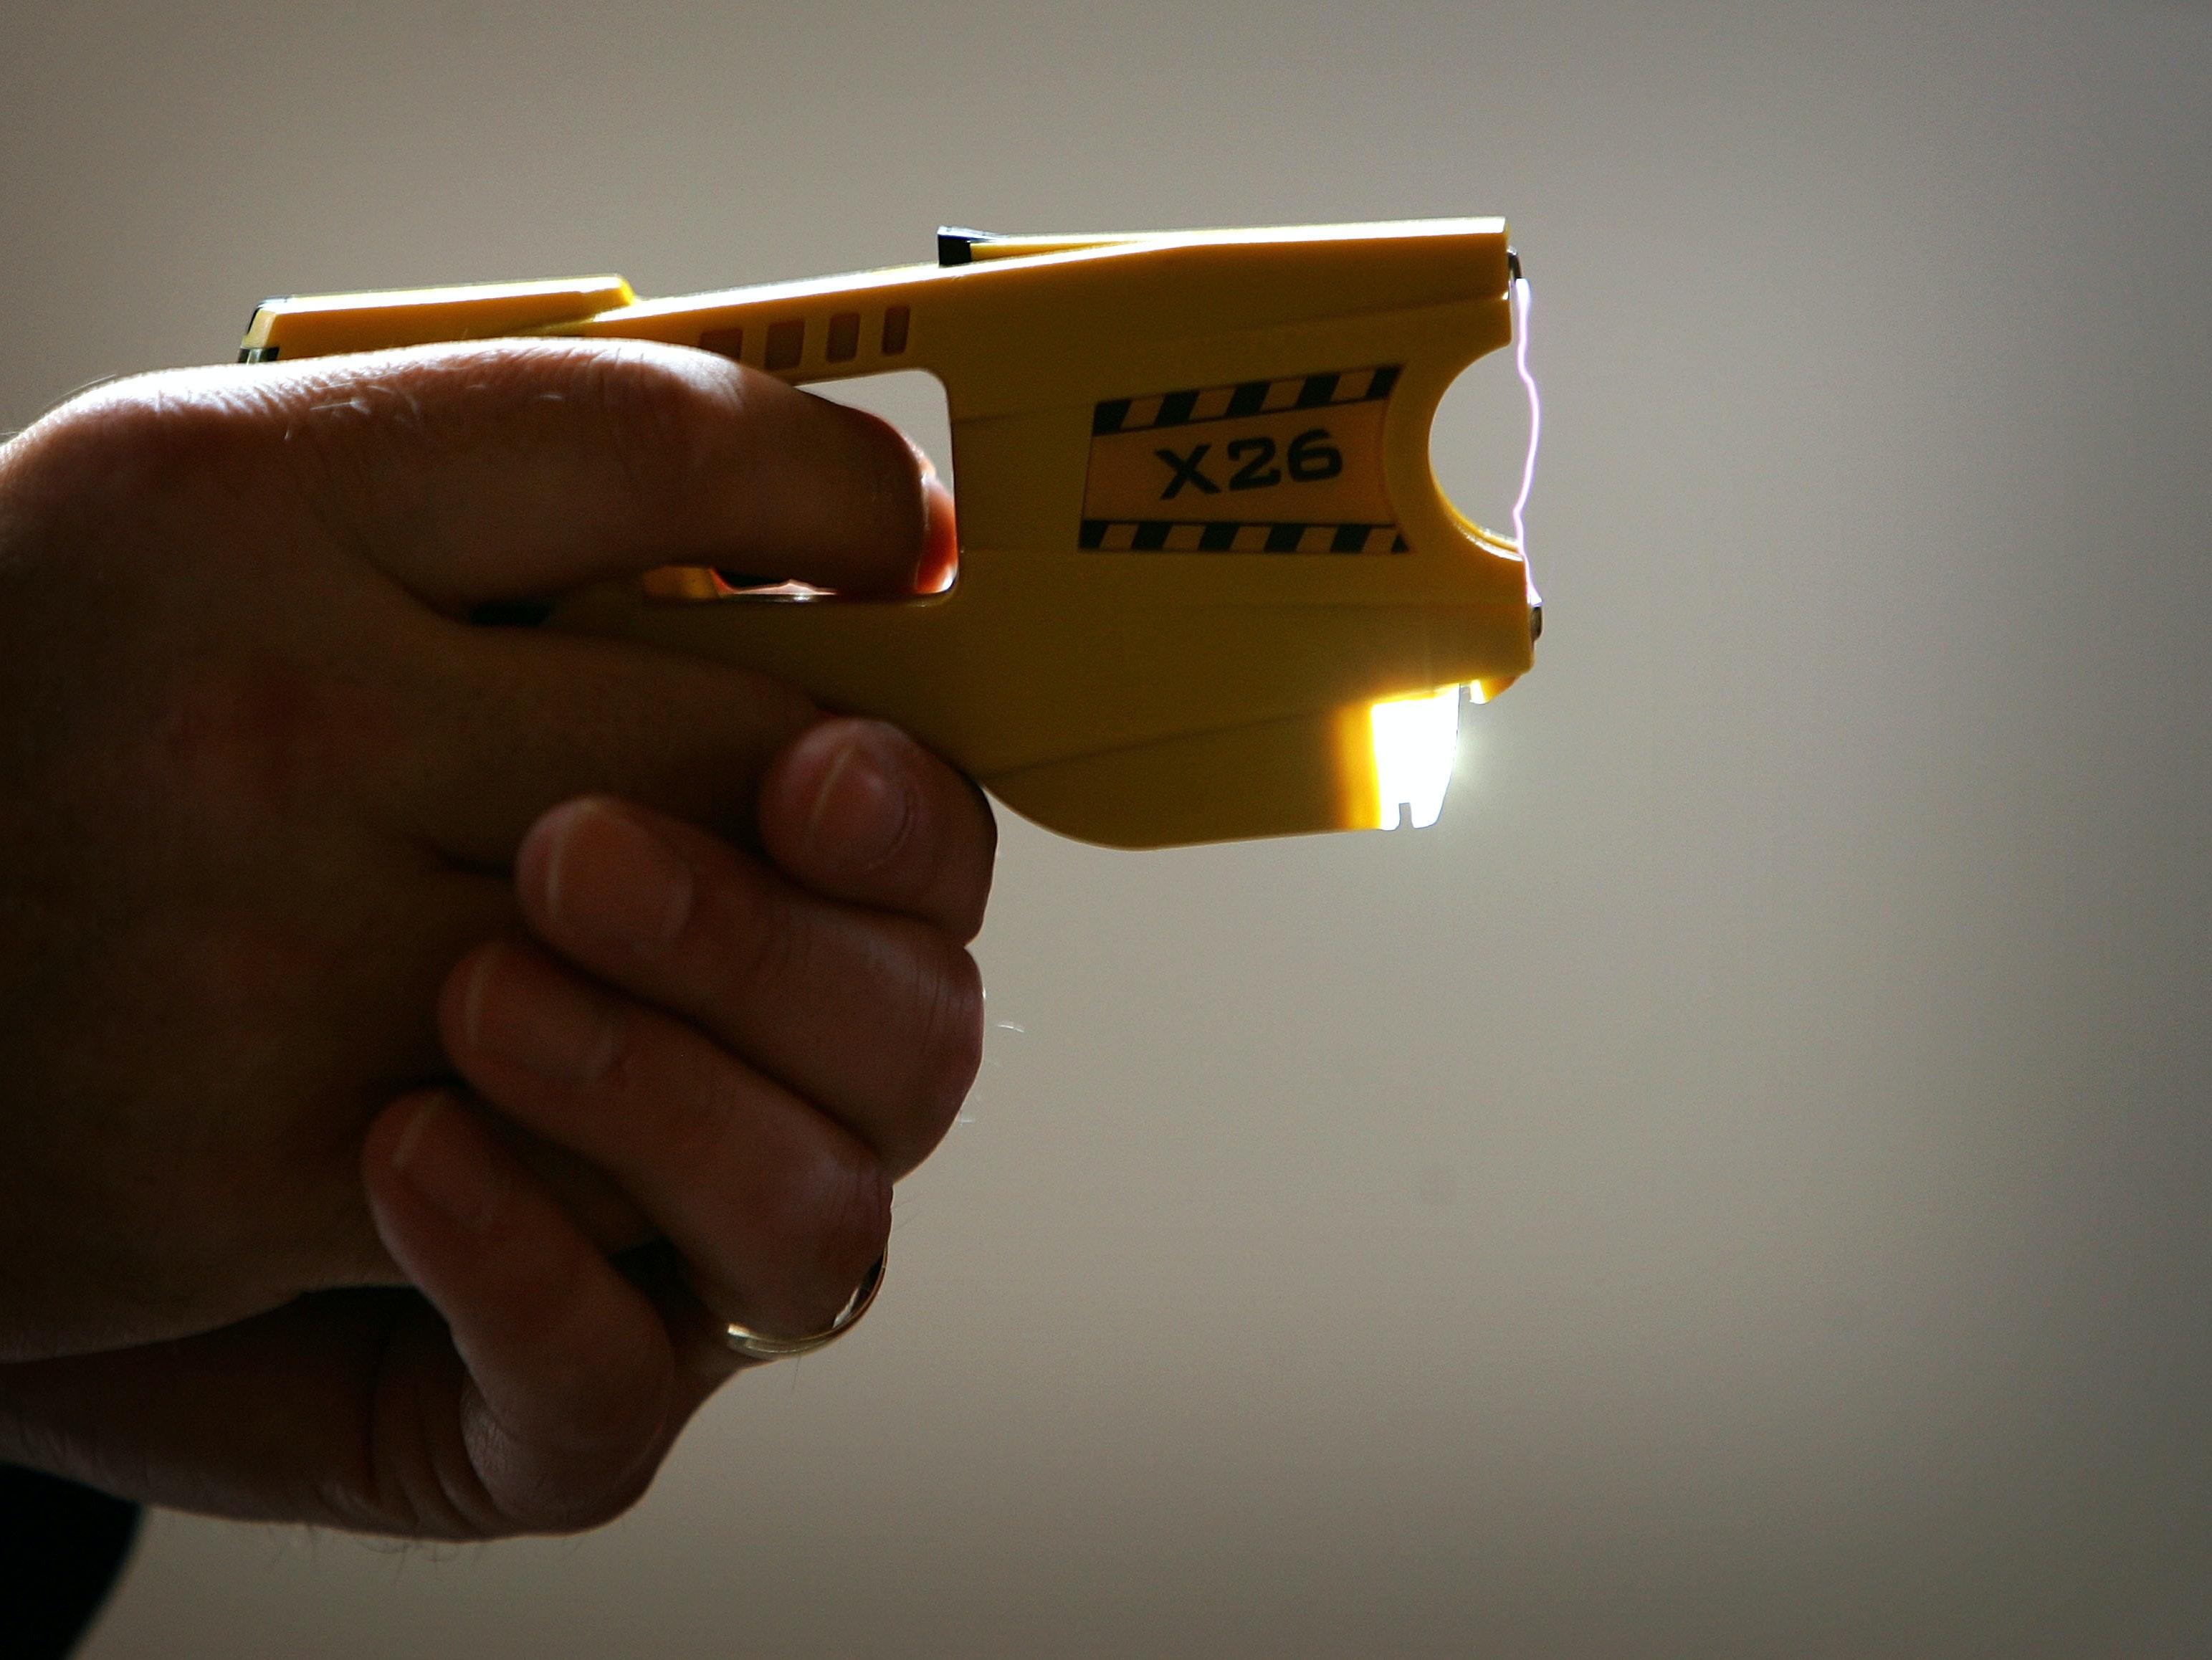 This Prototype Stun Gun Monitors Heart Rates to Save Lives